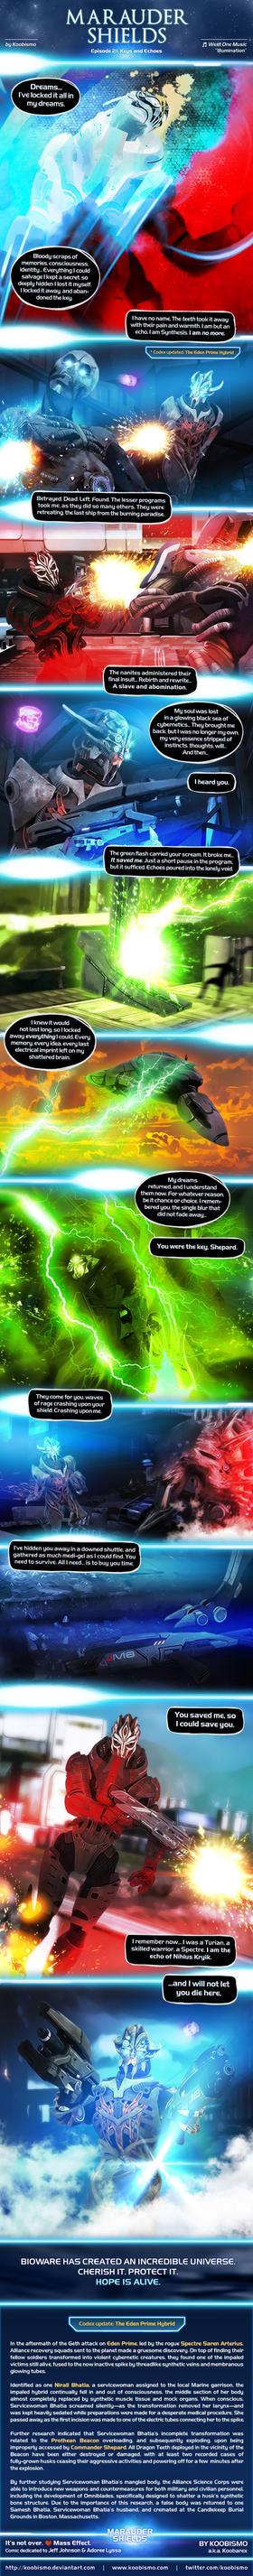 Marauder Shields 21: Keys and Echoes (Mass Effect) by koobismo